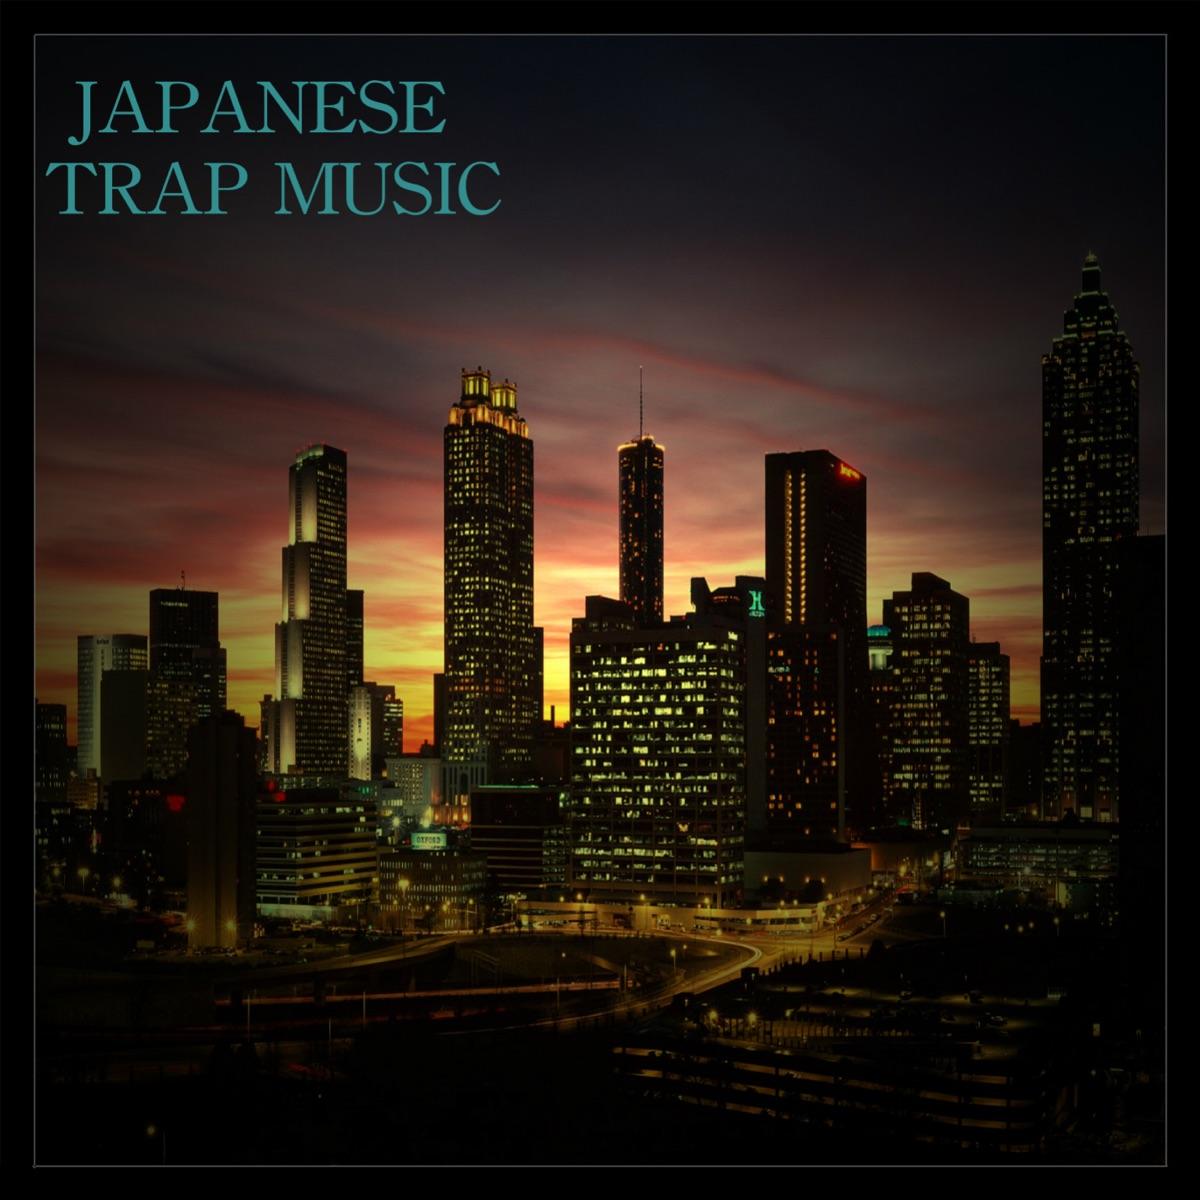 Japanese Trap Music